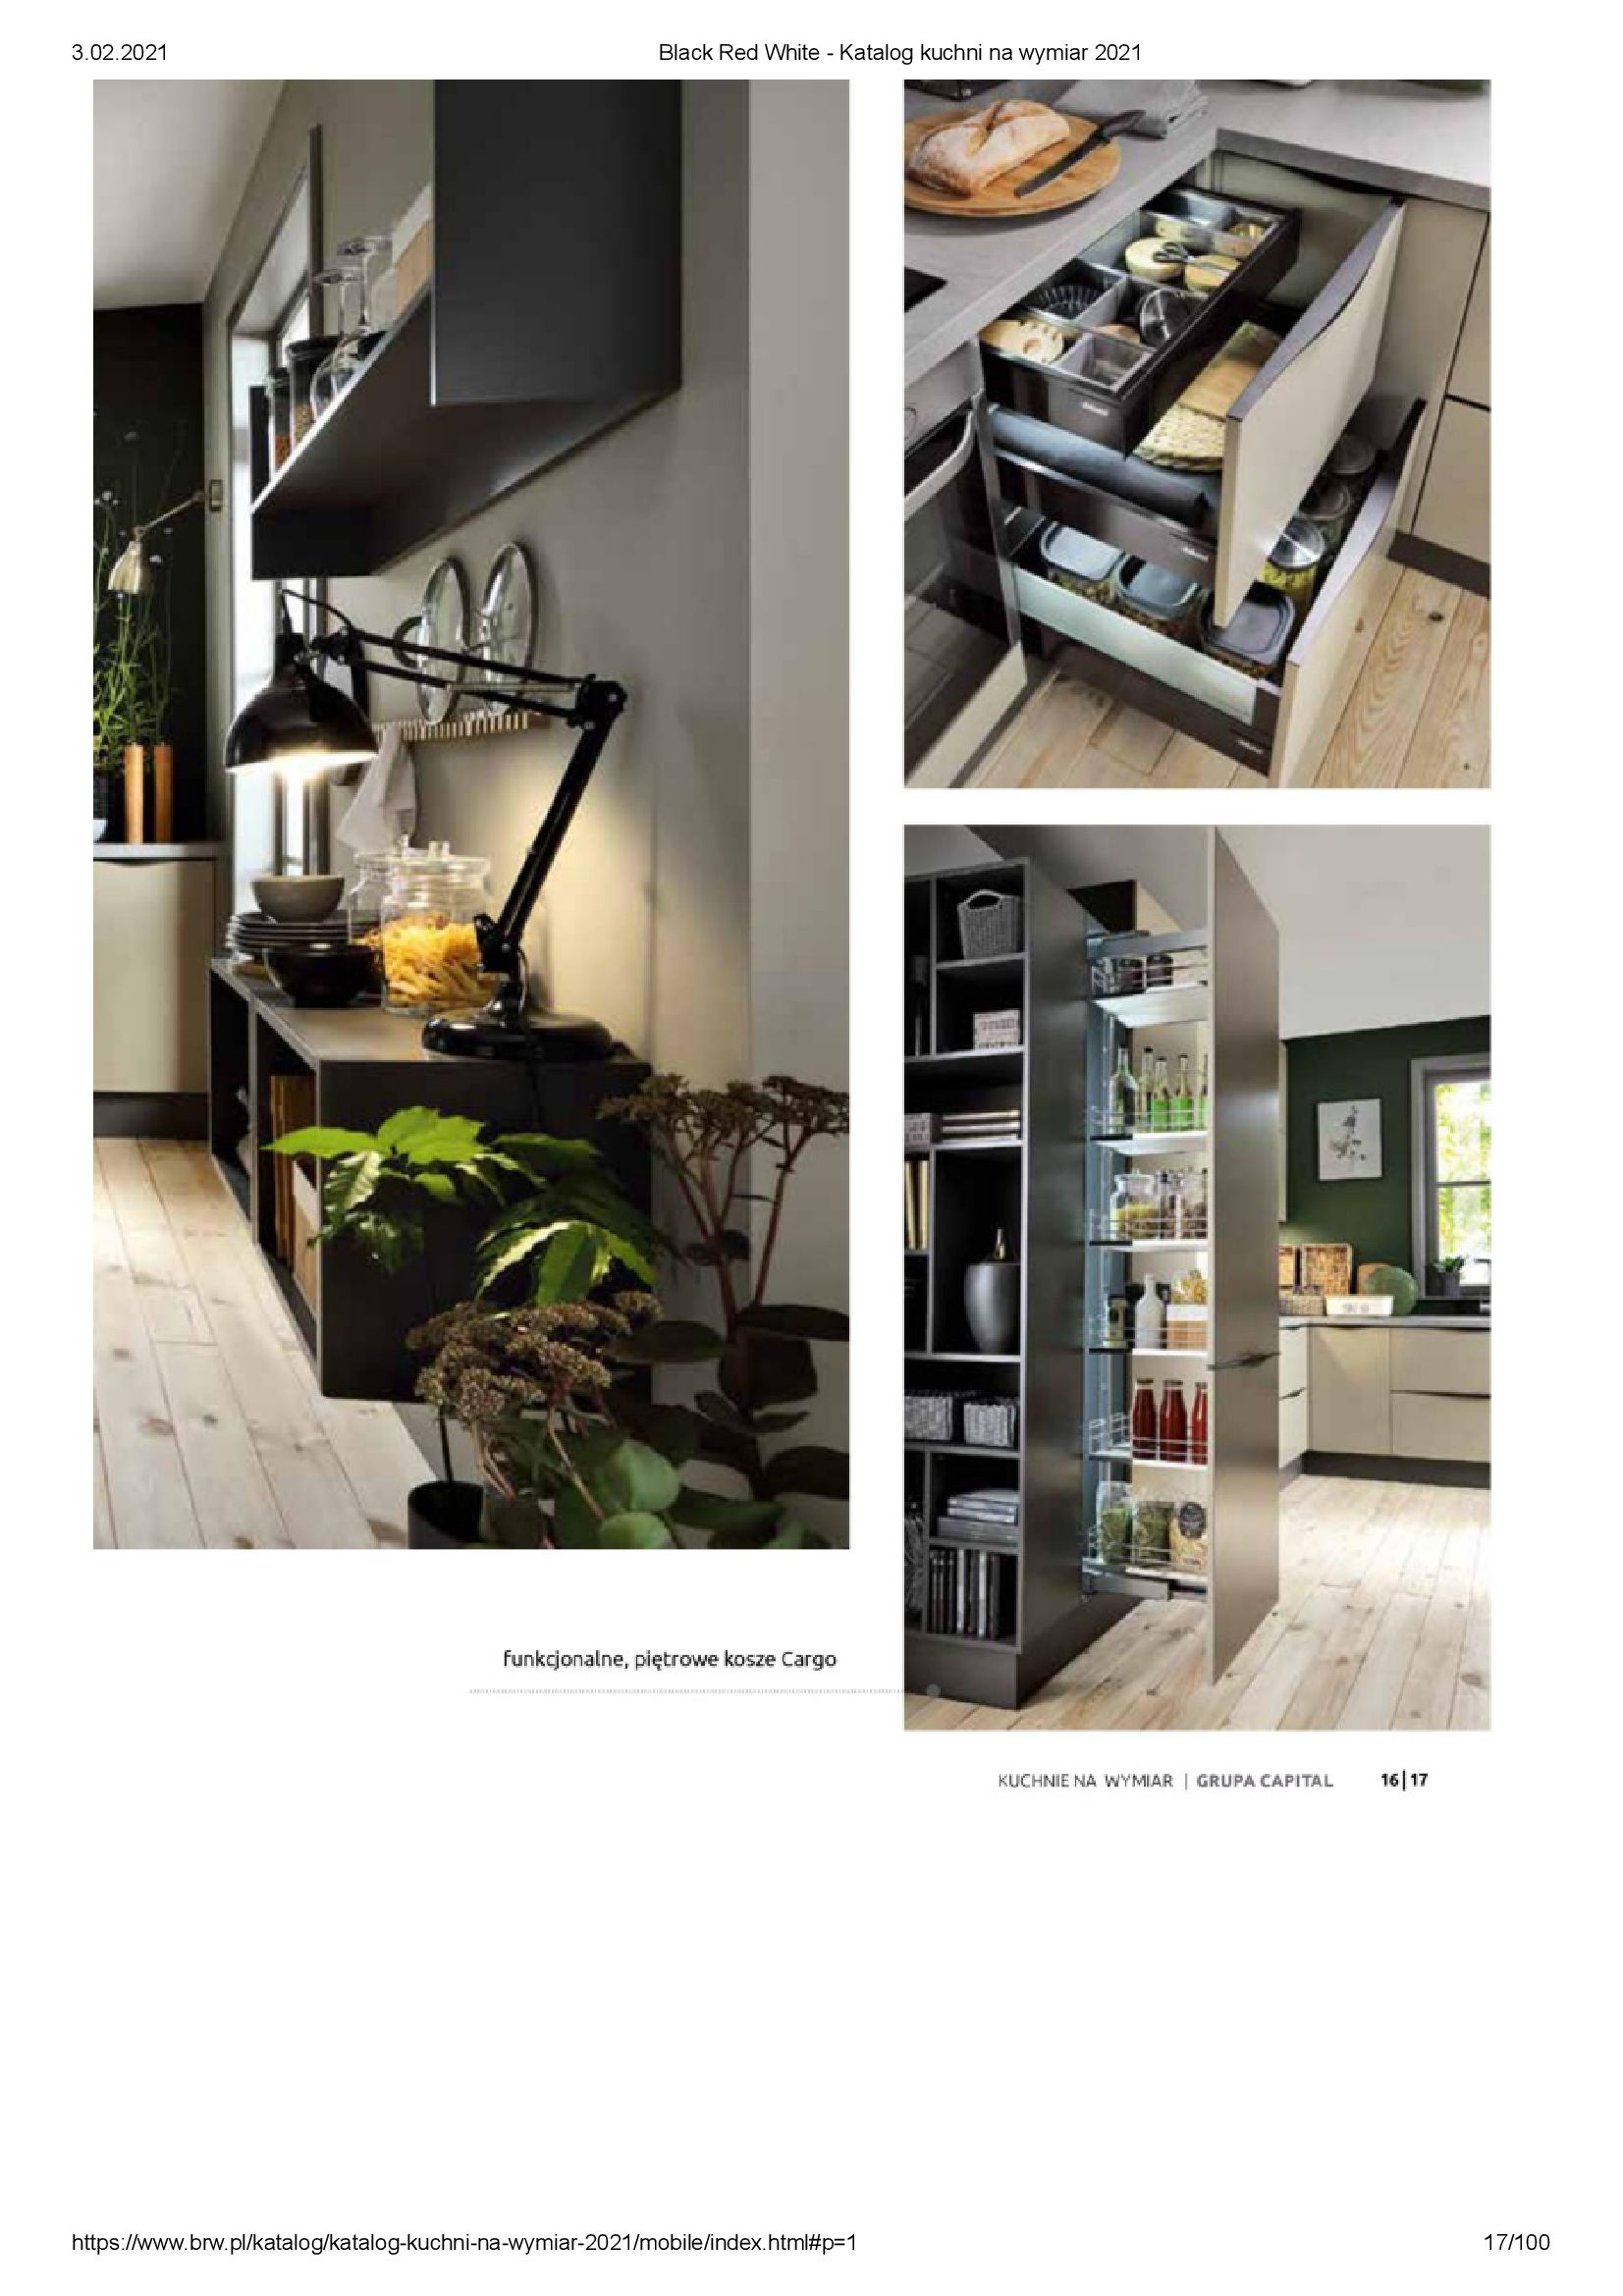 Gazetka Black Red White: Katalog - Kuchnie na wymiar Senso Kitchens 2021 2021-01-01 page-17